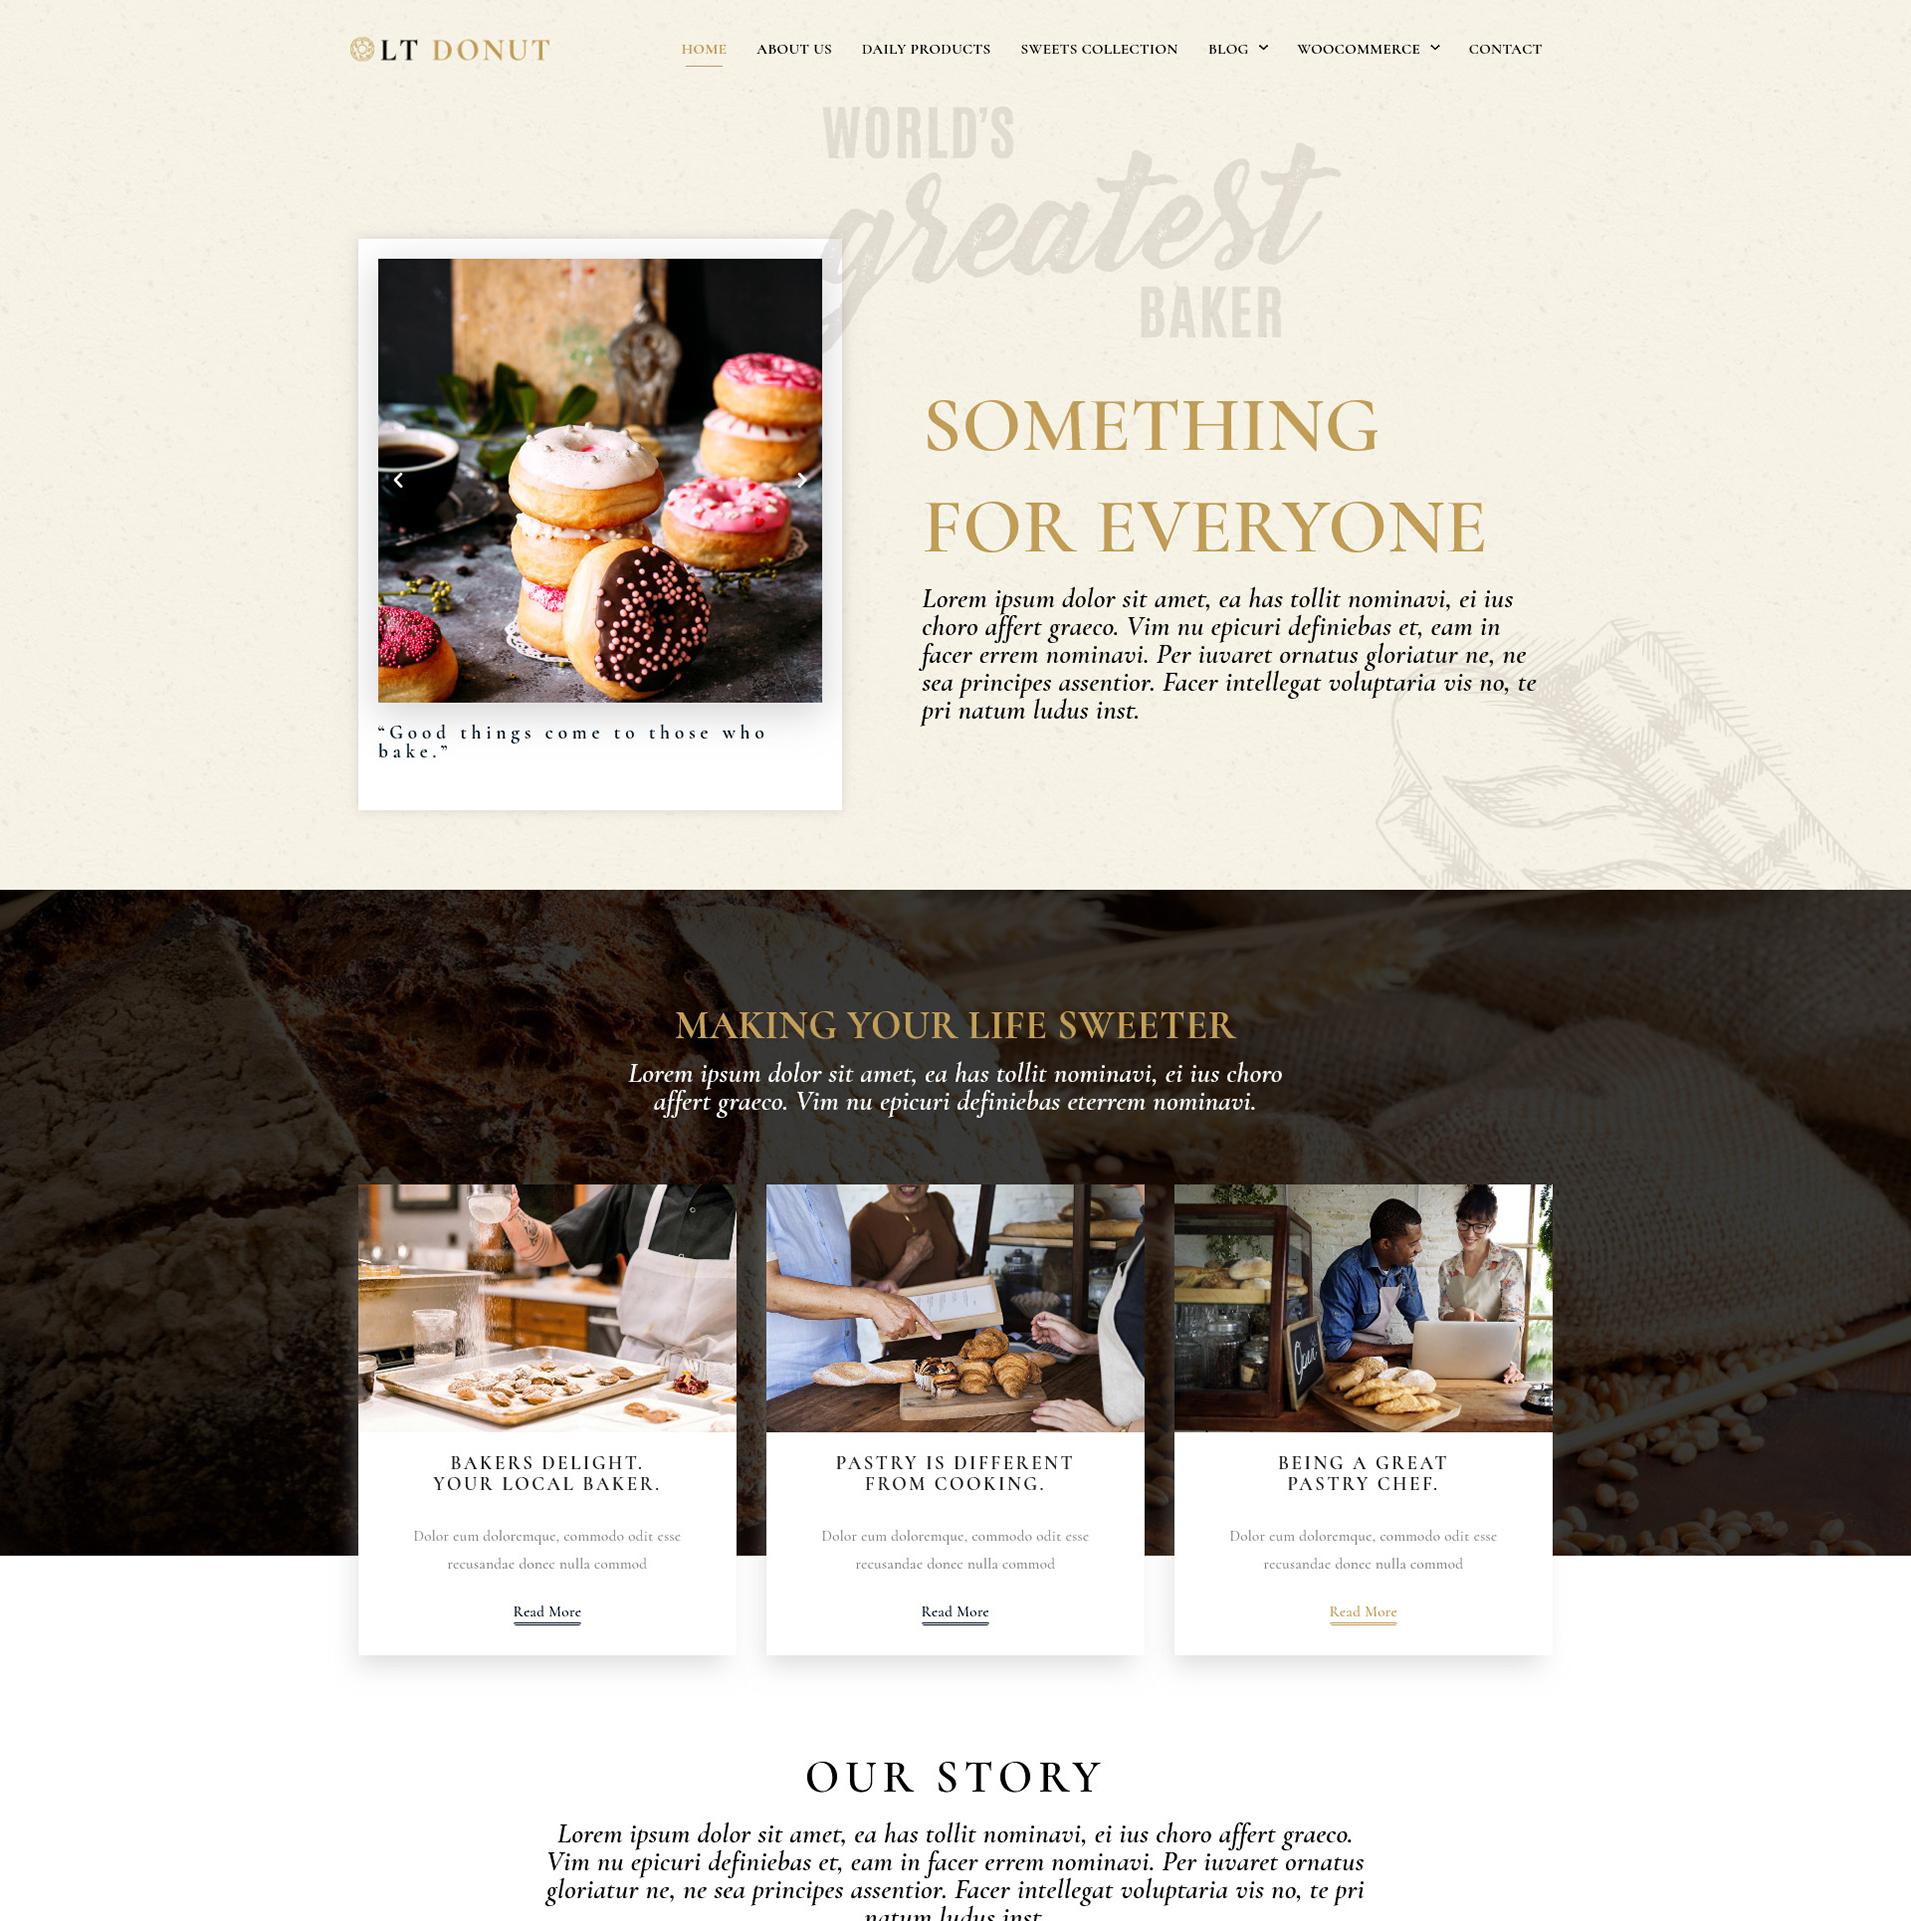 https://ltheme.com/project/lt-donut-free-responsive-bread-store-donuts-wordpress-theme/